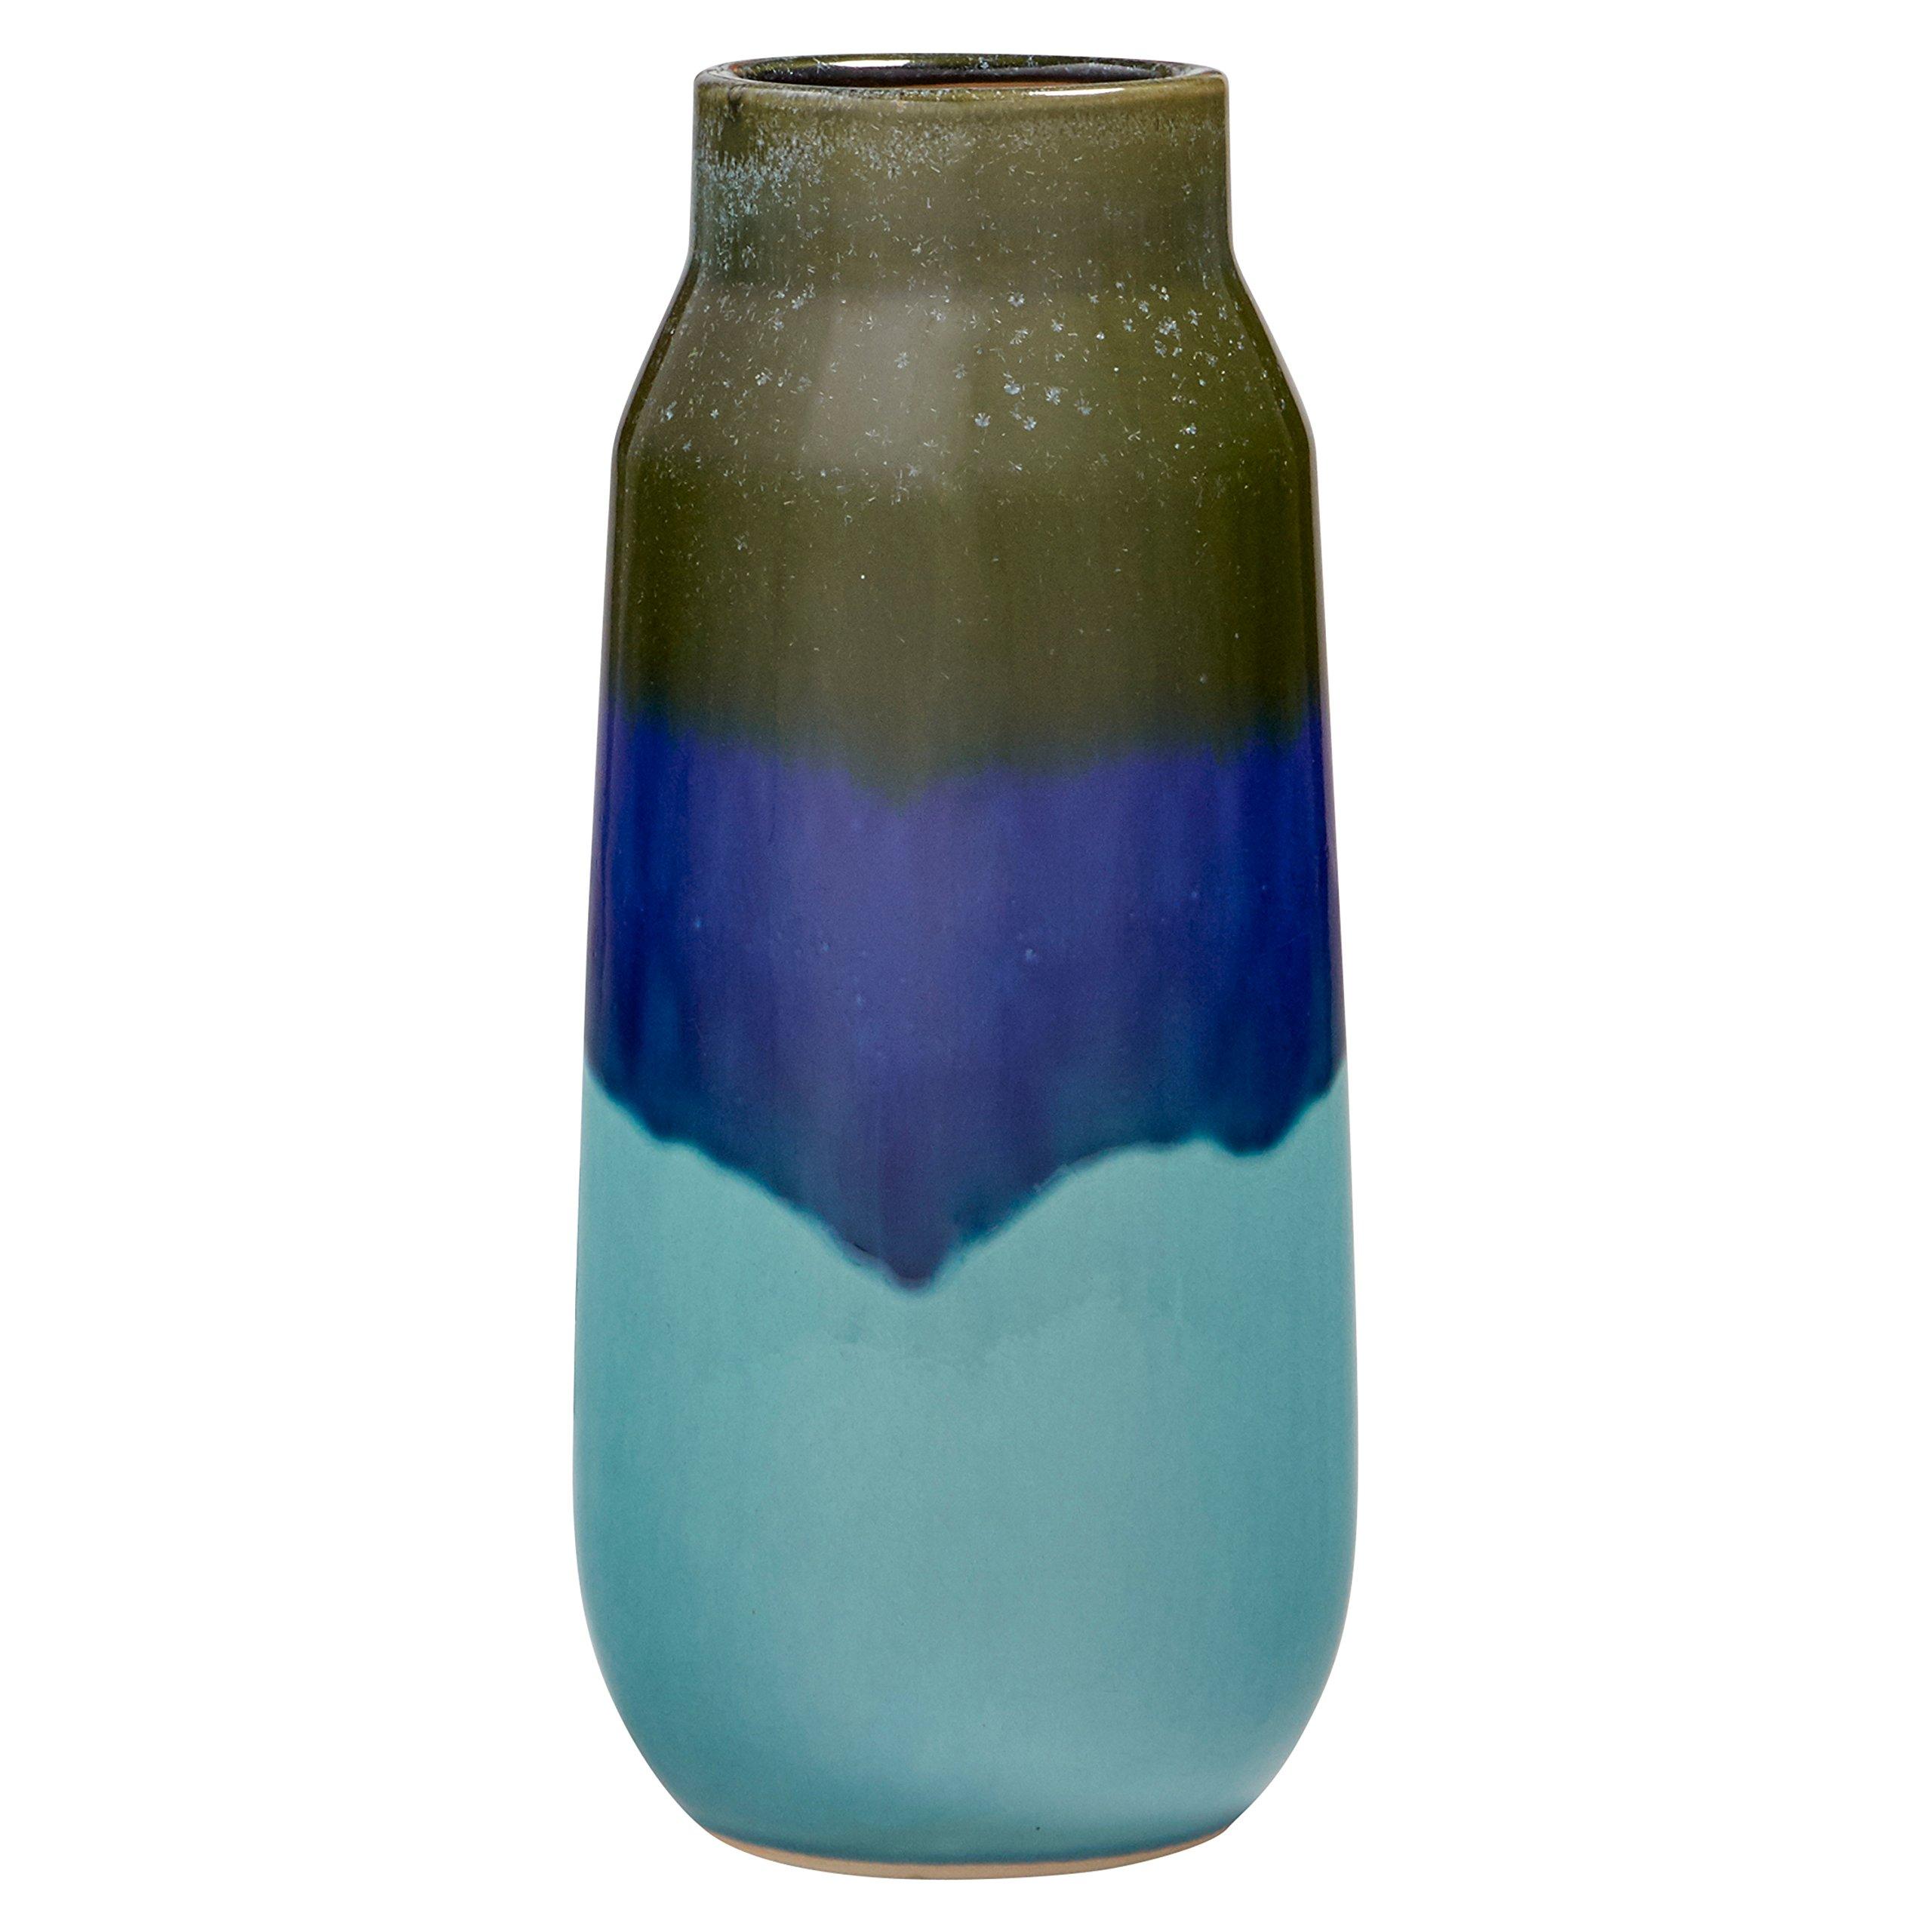 CDM product Rivet Mid Century Modern Ceramic Home Decor Flower Vase - 12 Inch, Blue and Green big image